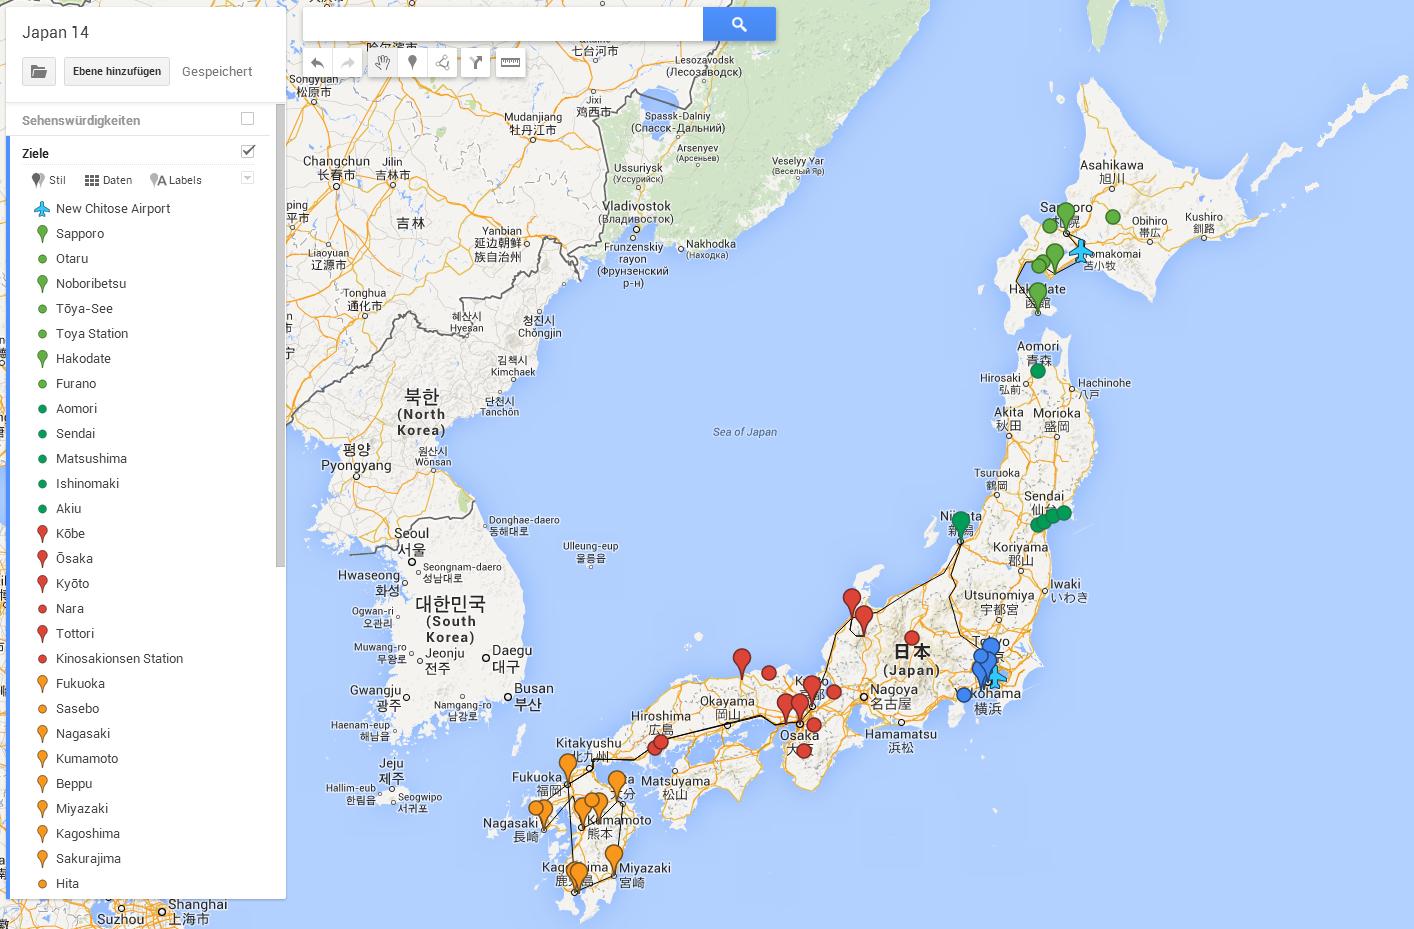 Japan 2014 Tabimonogatari 旅物語